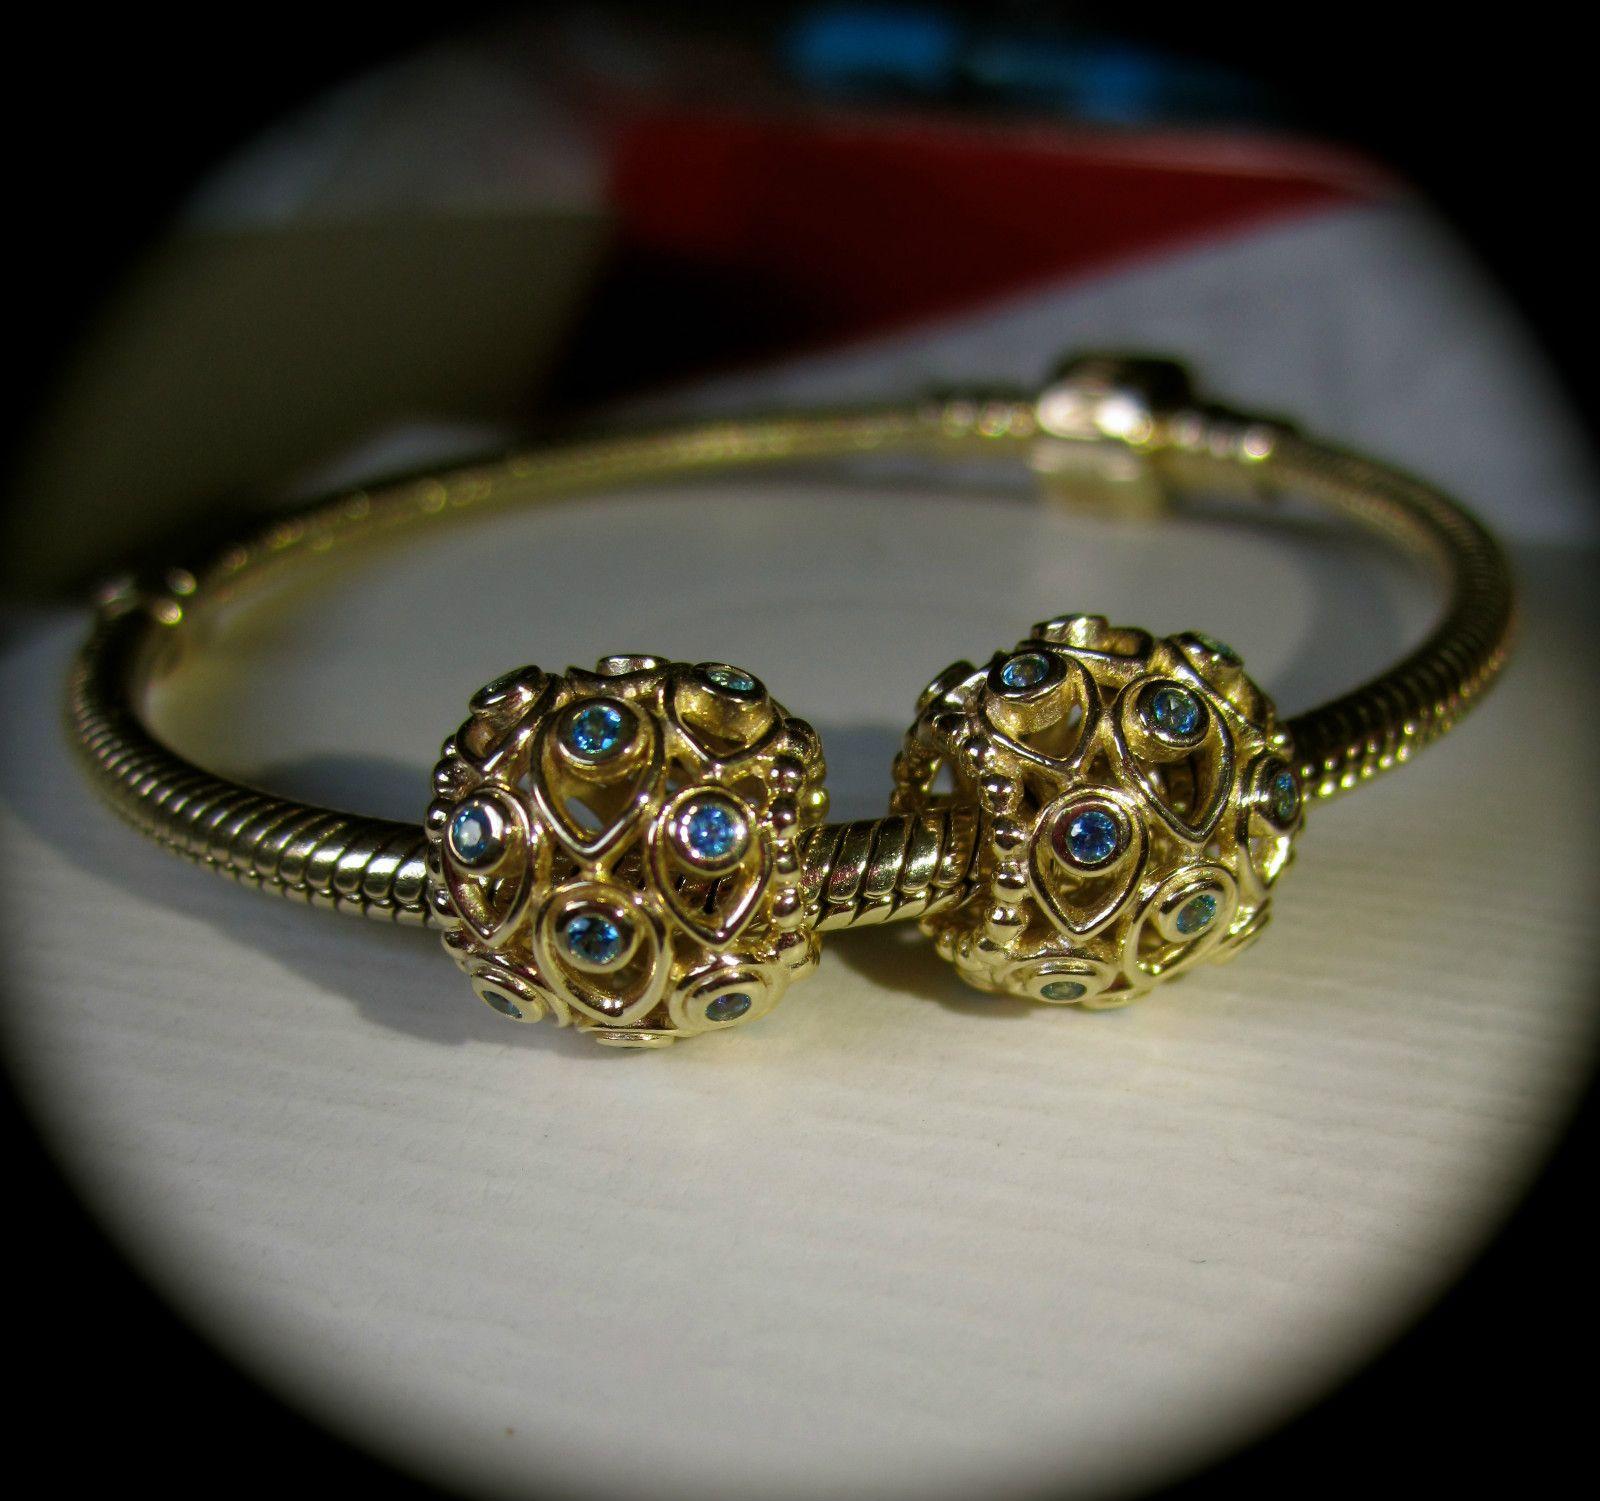 08435aca7 14k Gold Pandora Ocean Treasures charms with deep blue topaz stones ...